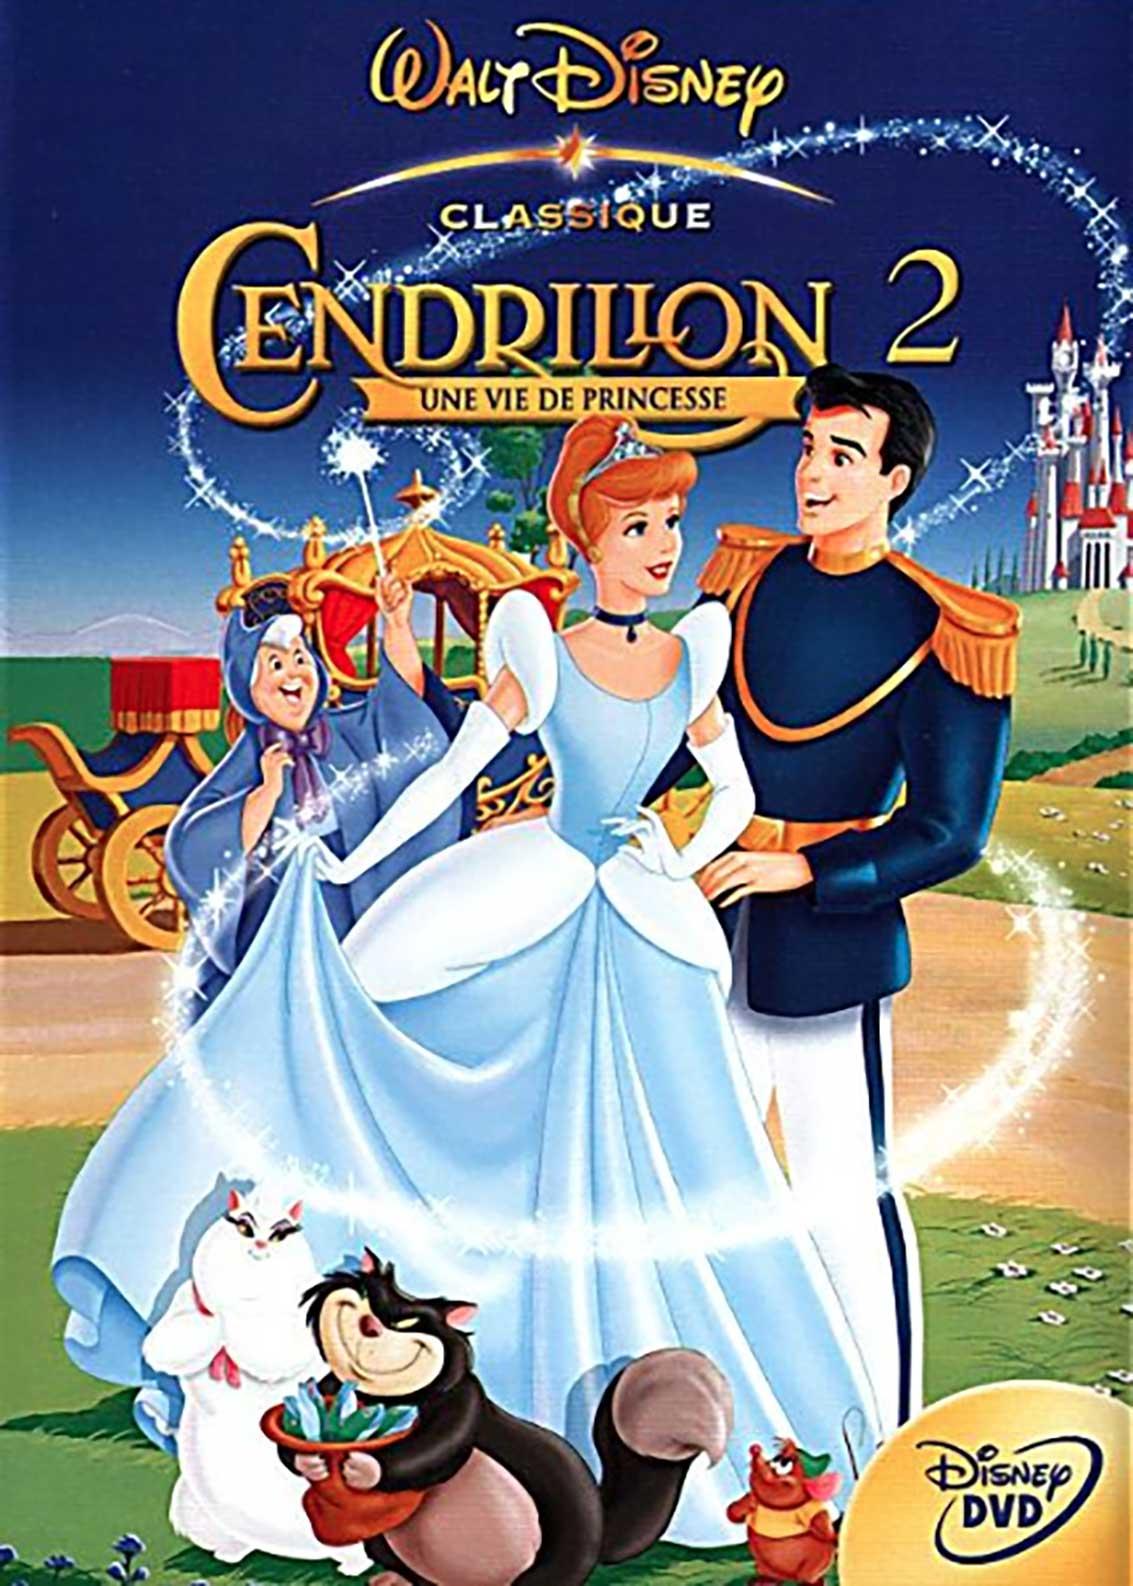 Affiche Poster cendrillon 2 cinderella dreams come true disney disneytoon